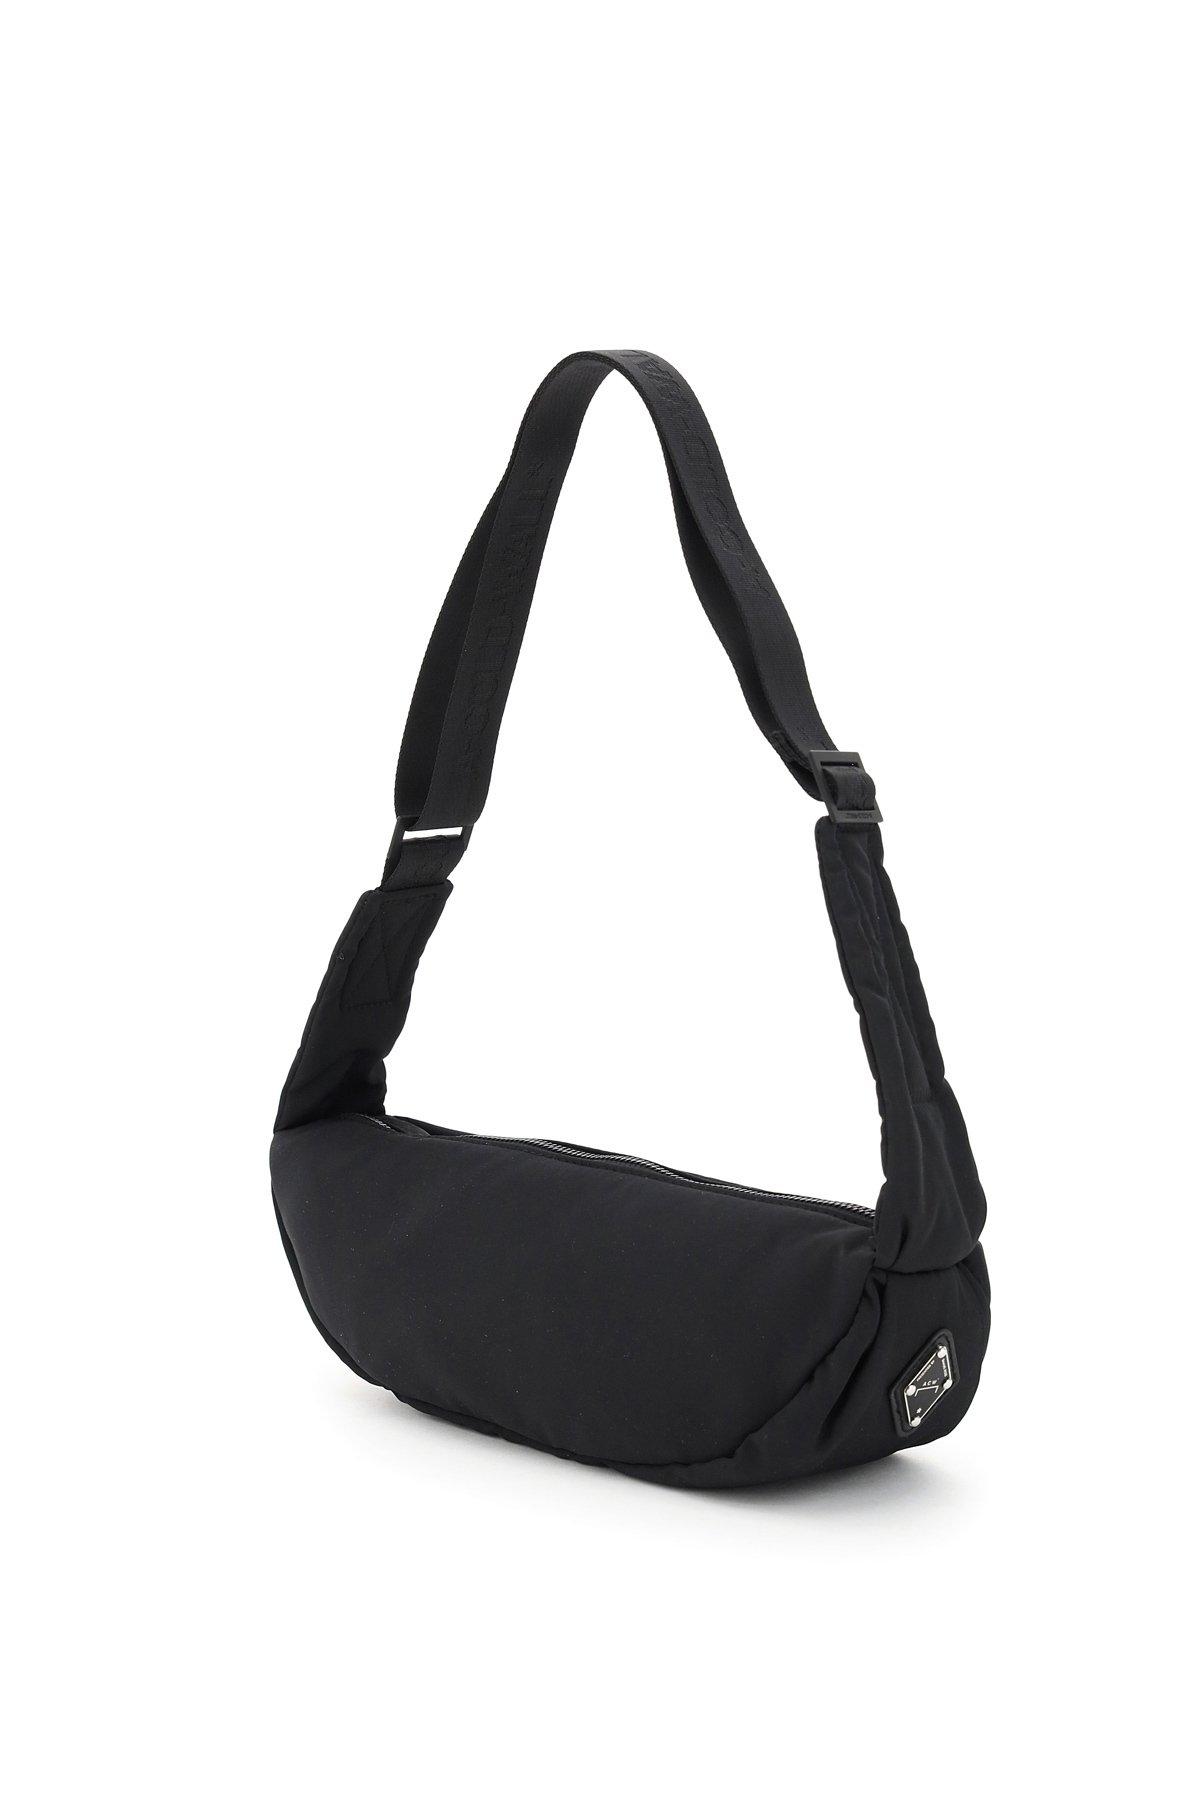 A cold wall bodybag crossbody rhombus